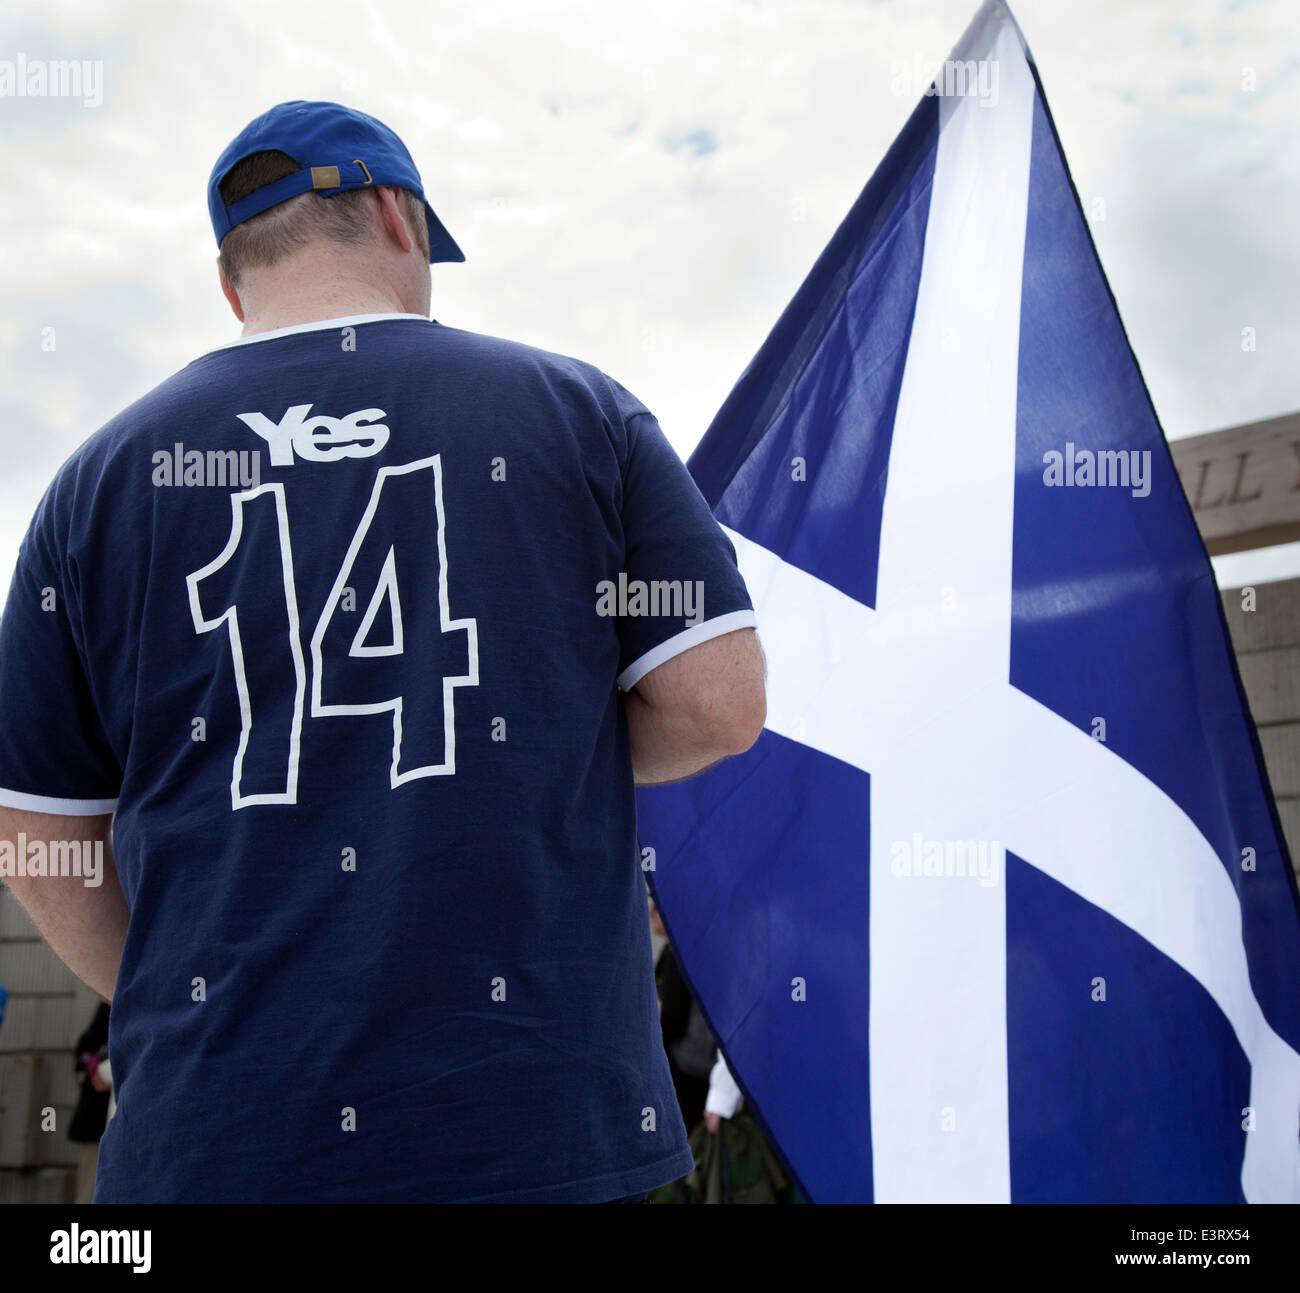 Stirling 28th June, 2014.  Scottish flag at the Battle of Bannockburn re-enactment. Thousands of people have turned - Stock Image